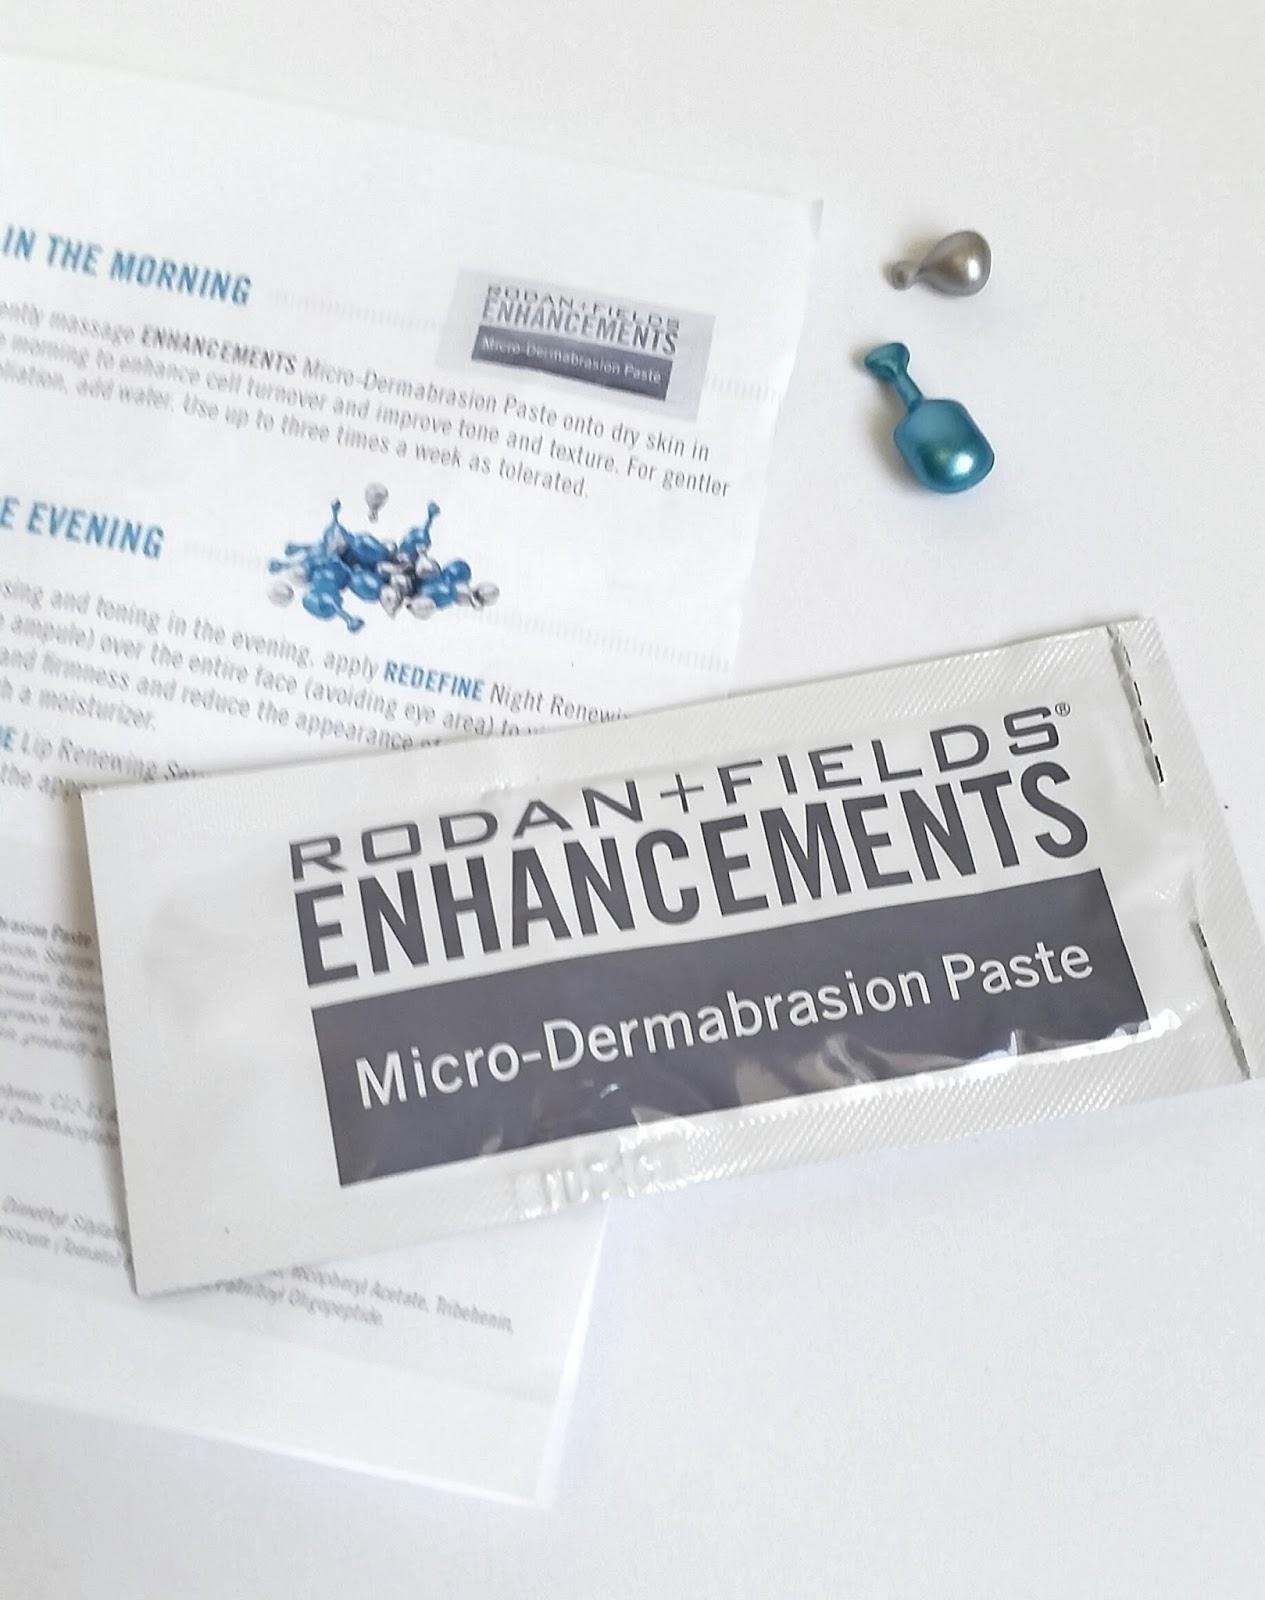 Forum on this topic: Rodan Fields Enhancements Body Micro-Dermabrasion, rodan-fields-enhancements-body-micro-dermabrasion/